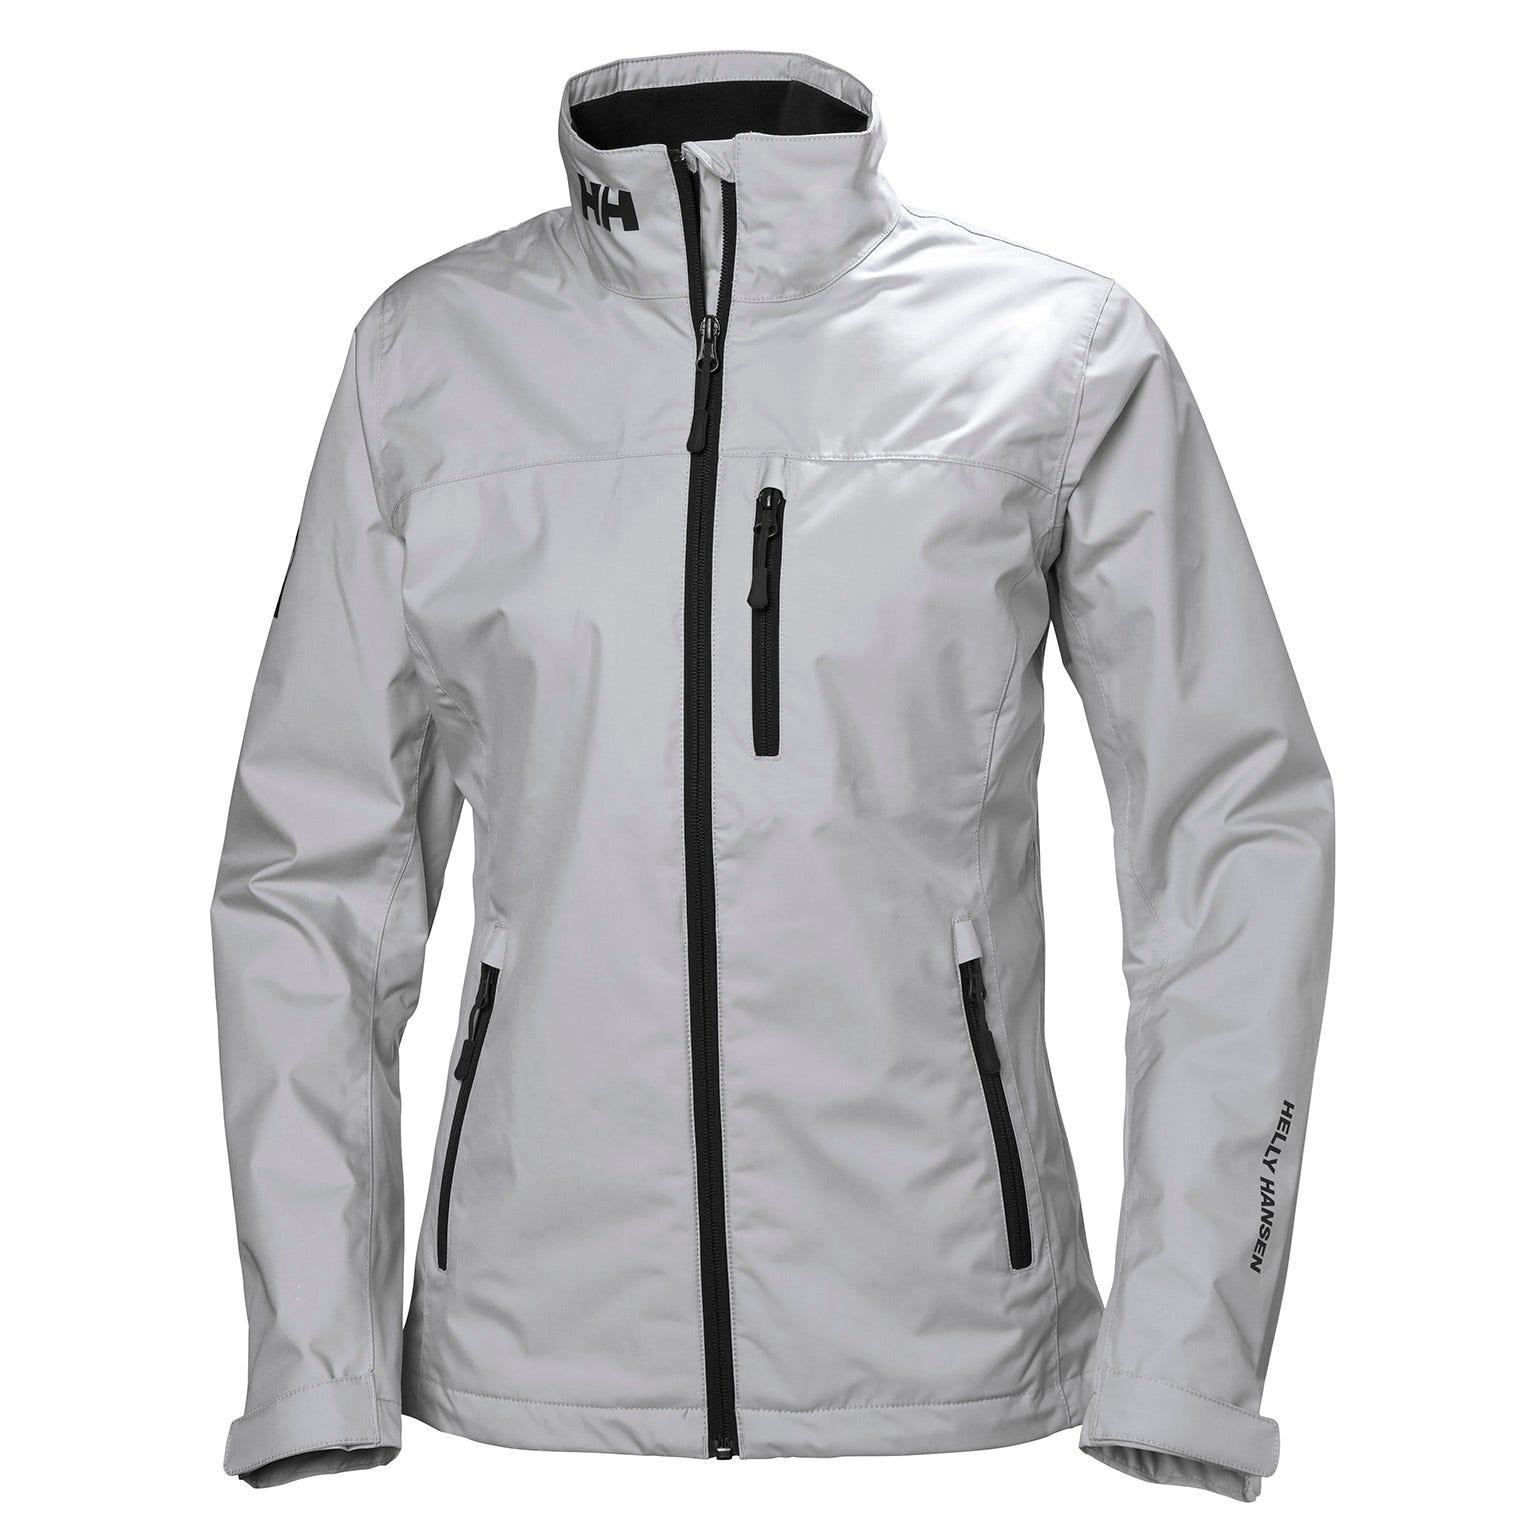 Helly Hansen Womens Crew Lightweight Waterproof Windproof Breathable Sailing Rain Coat Jacket